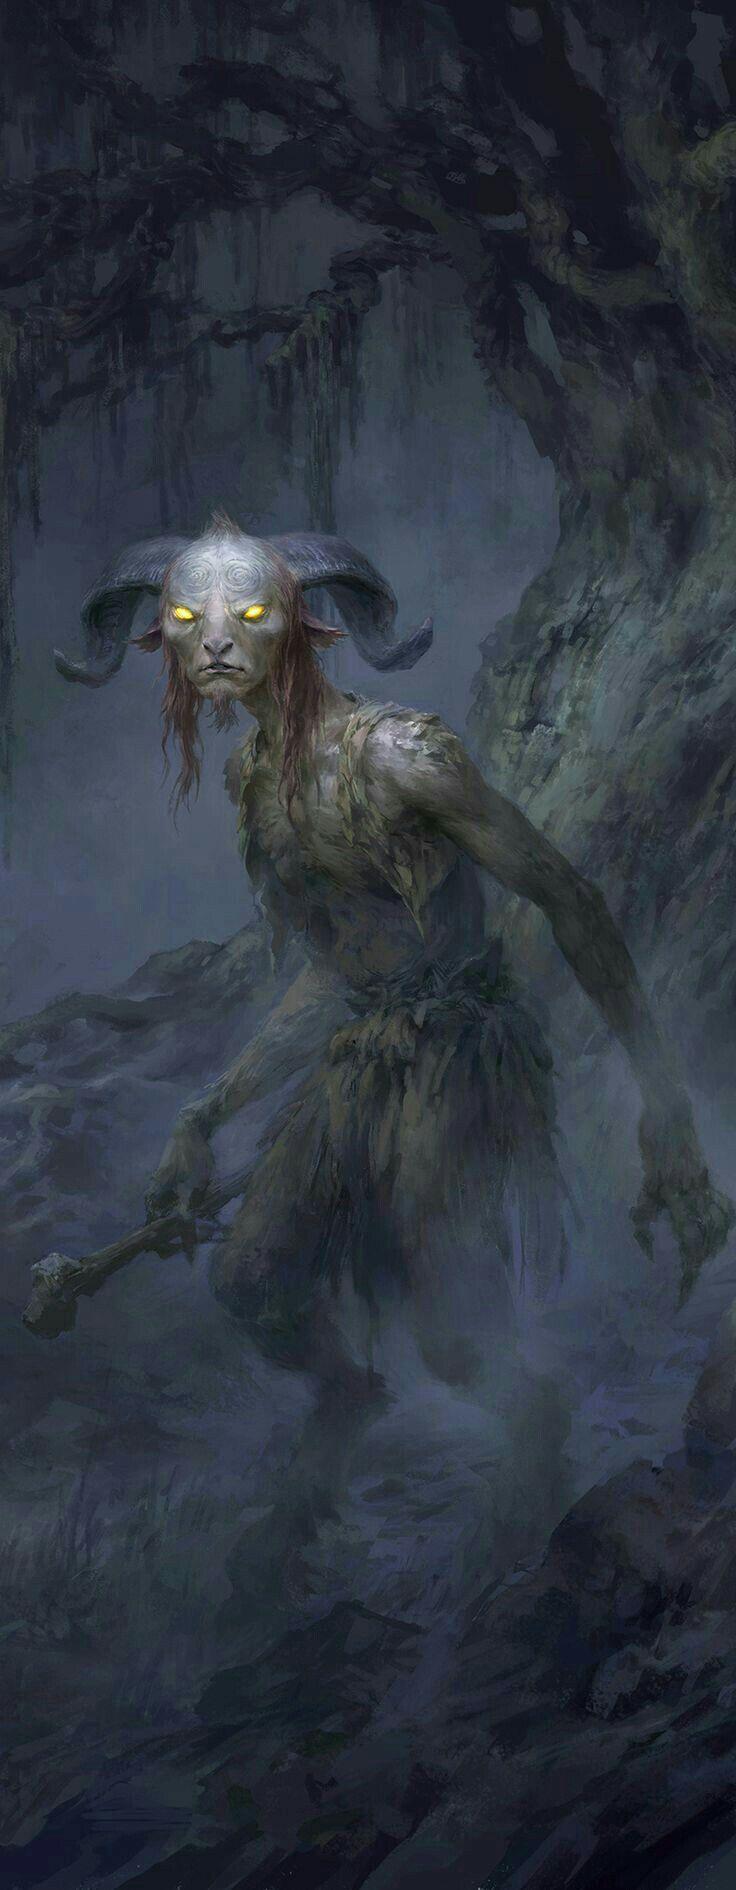 Faun belonging to a darker path....